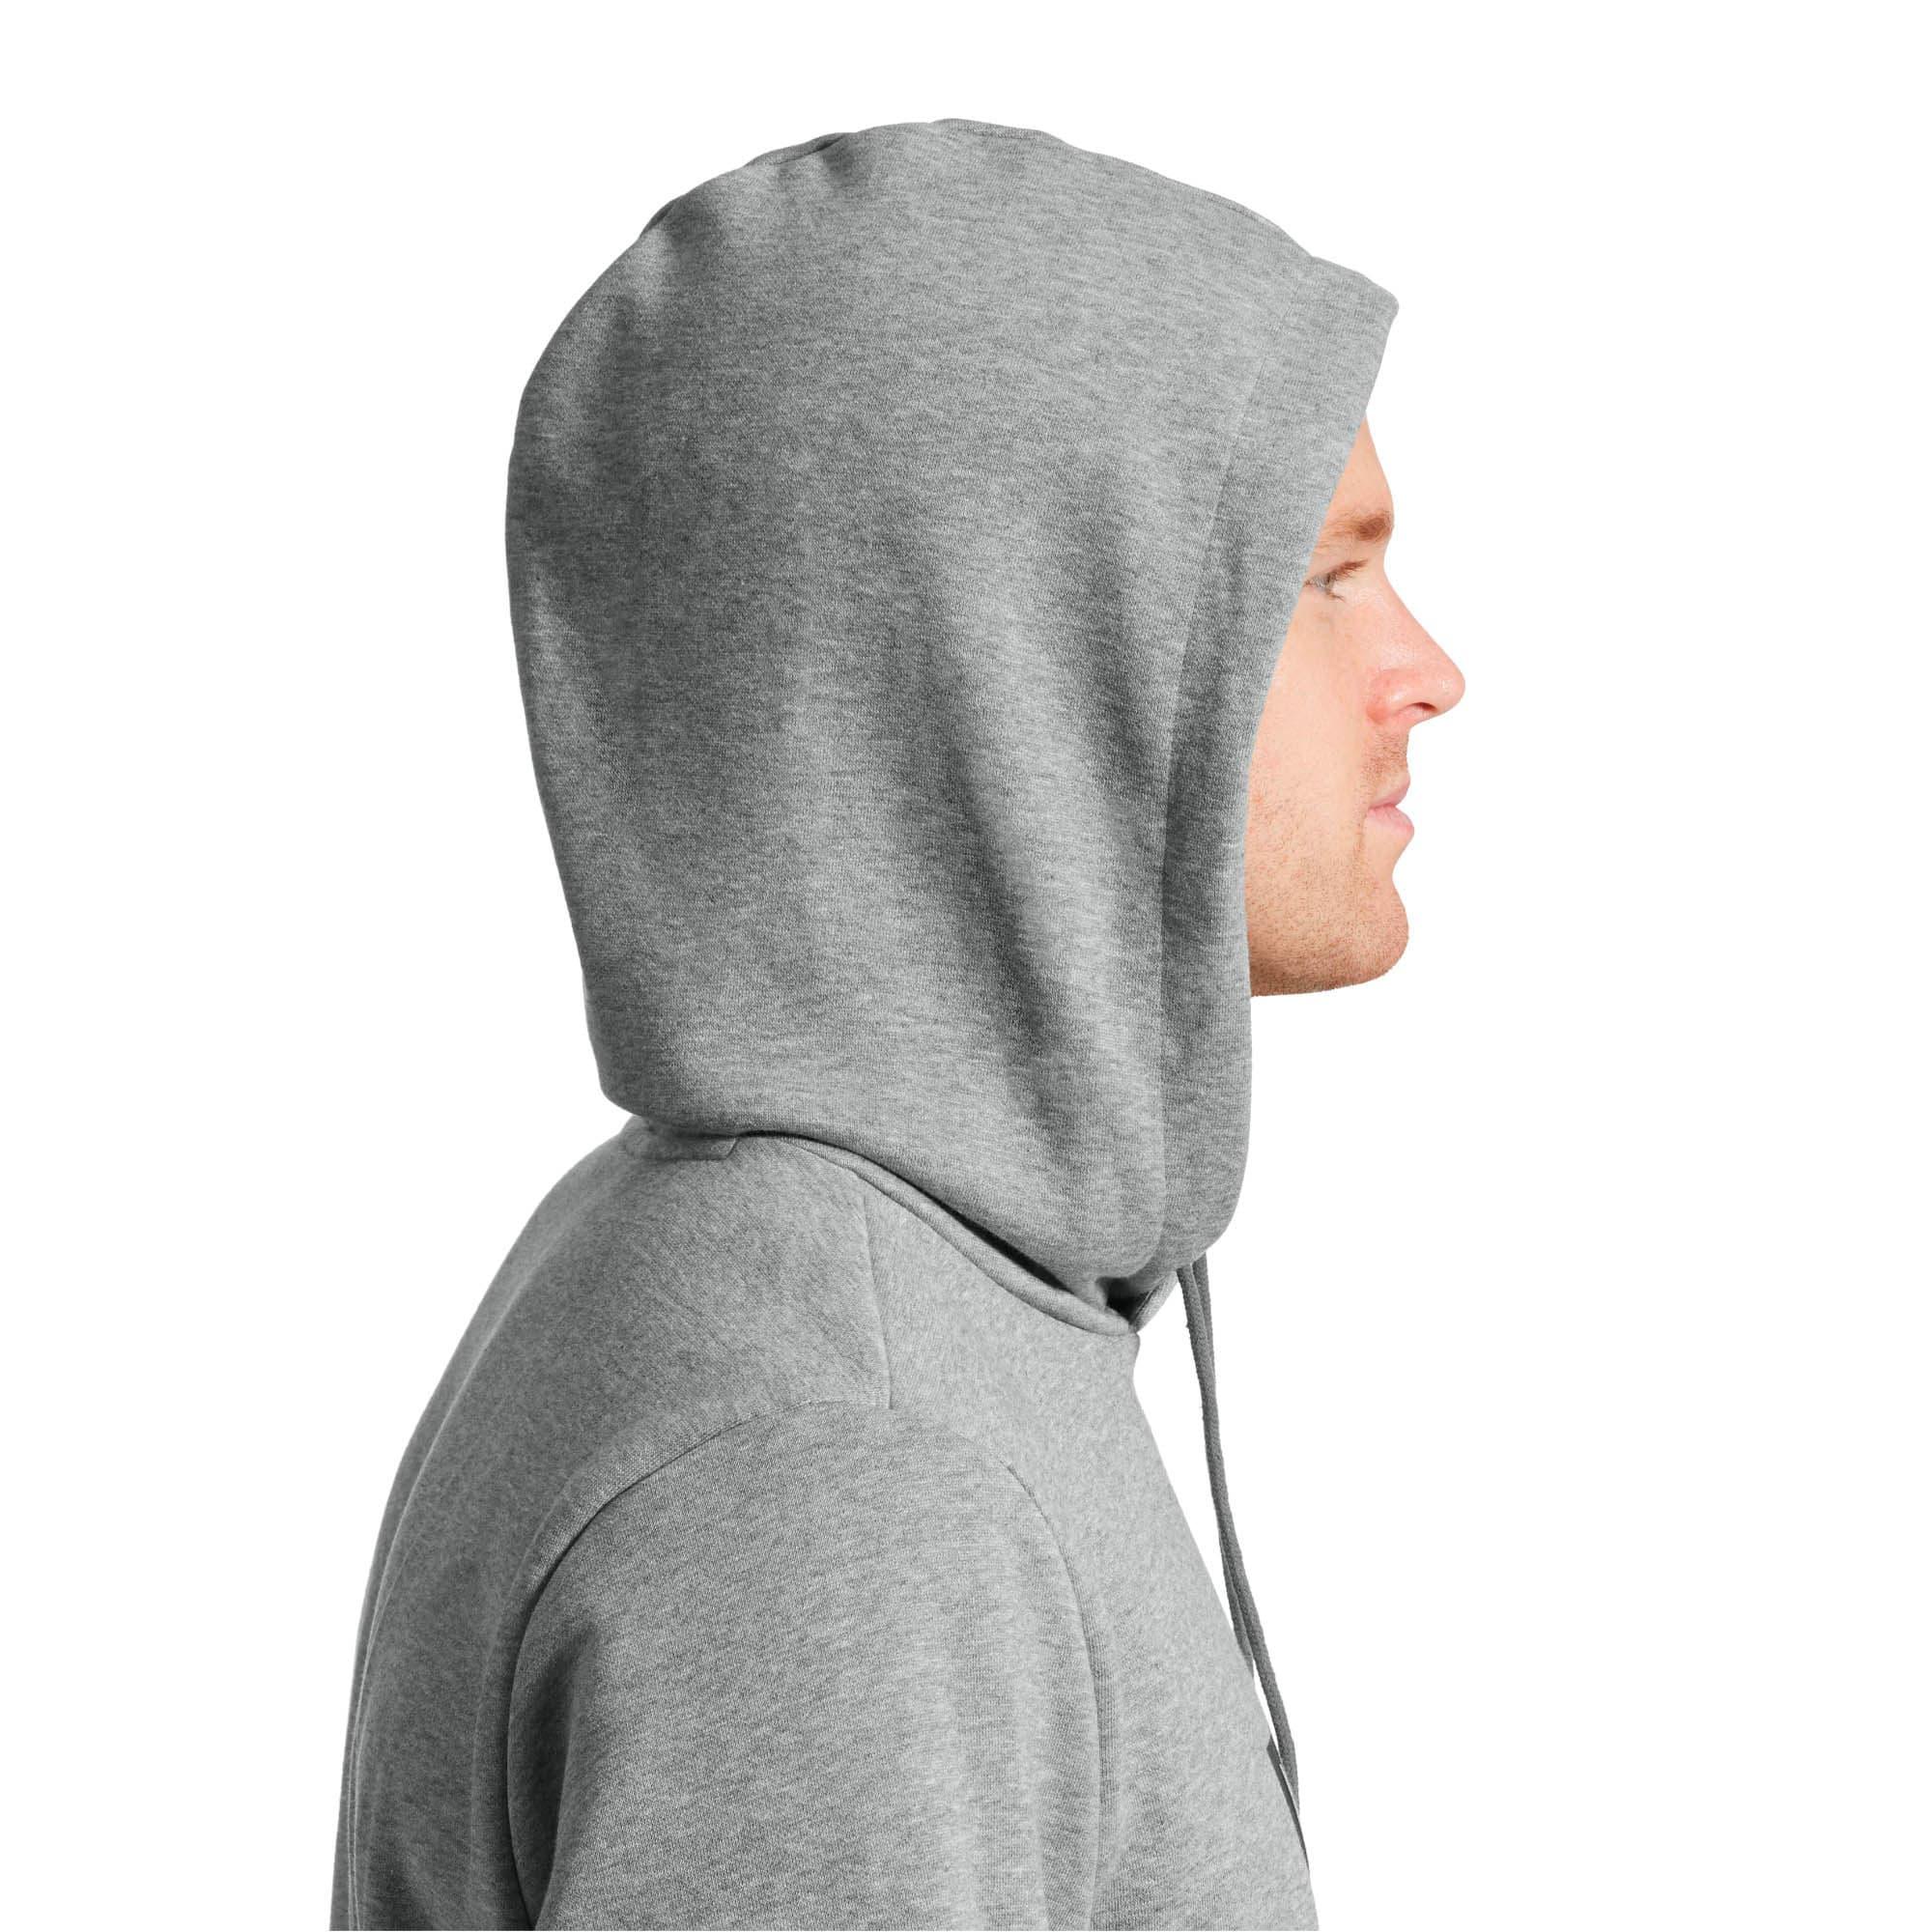 Thumbnail 4 of Essentials Men's Fleece Hoodie, Medium Gray Heather, medium